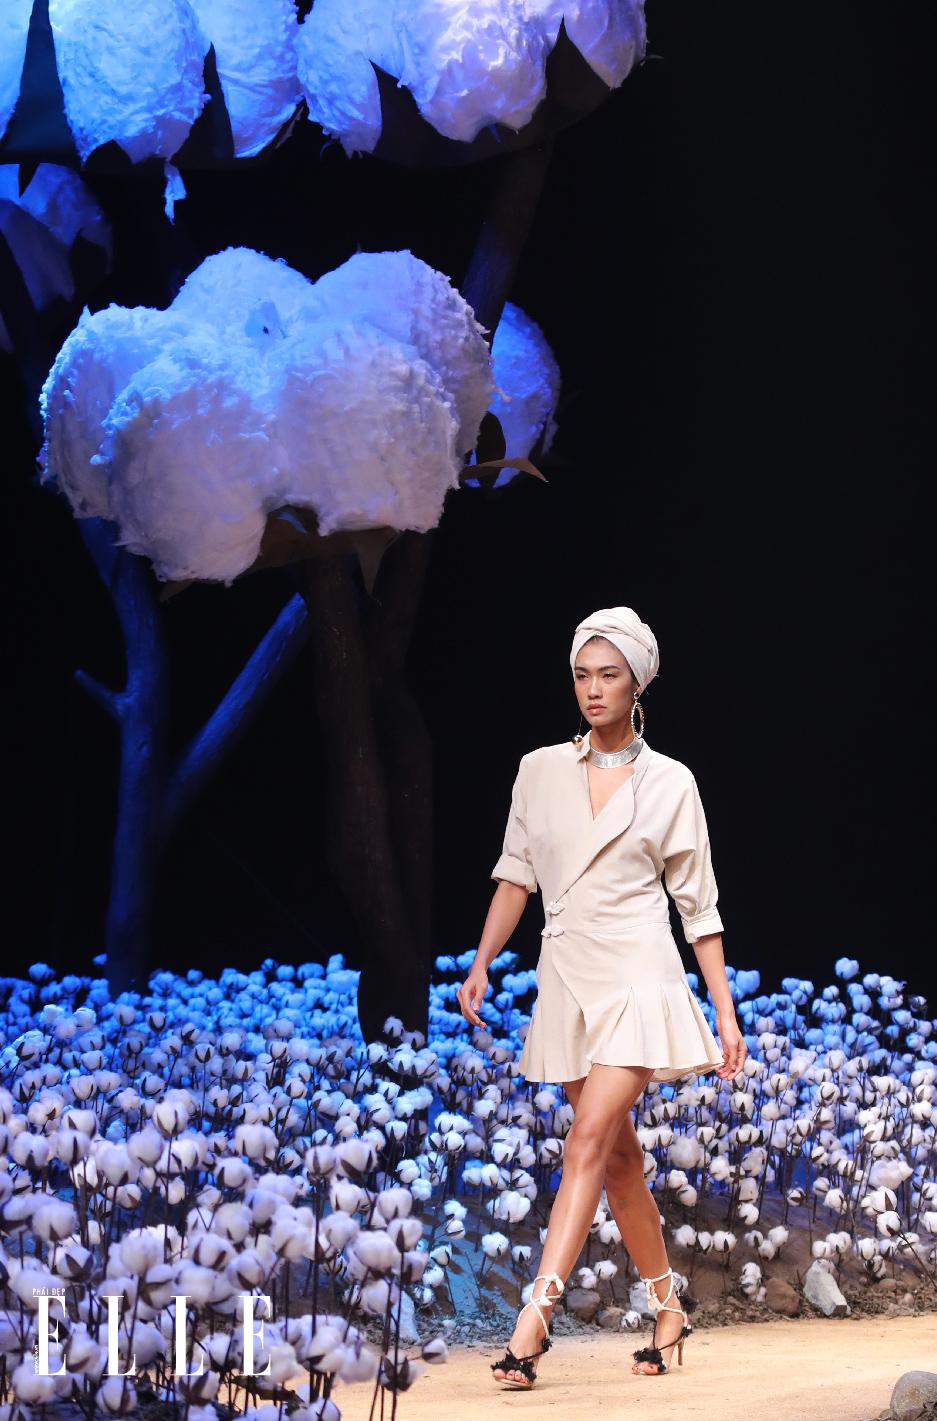 elle fashion journey 2017 ntk trương thanh hải